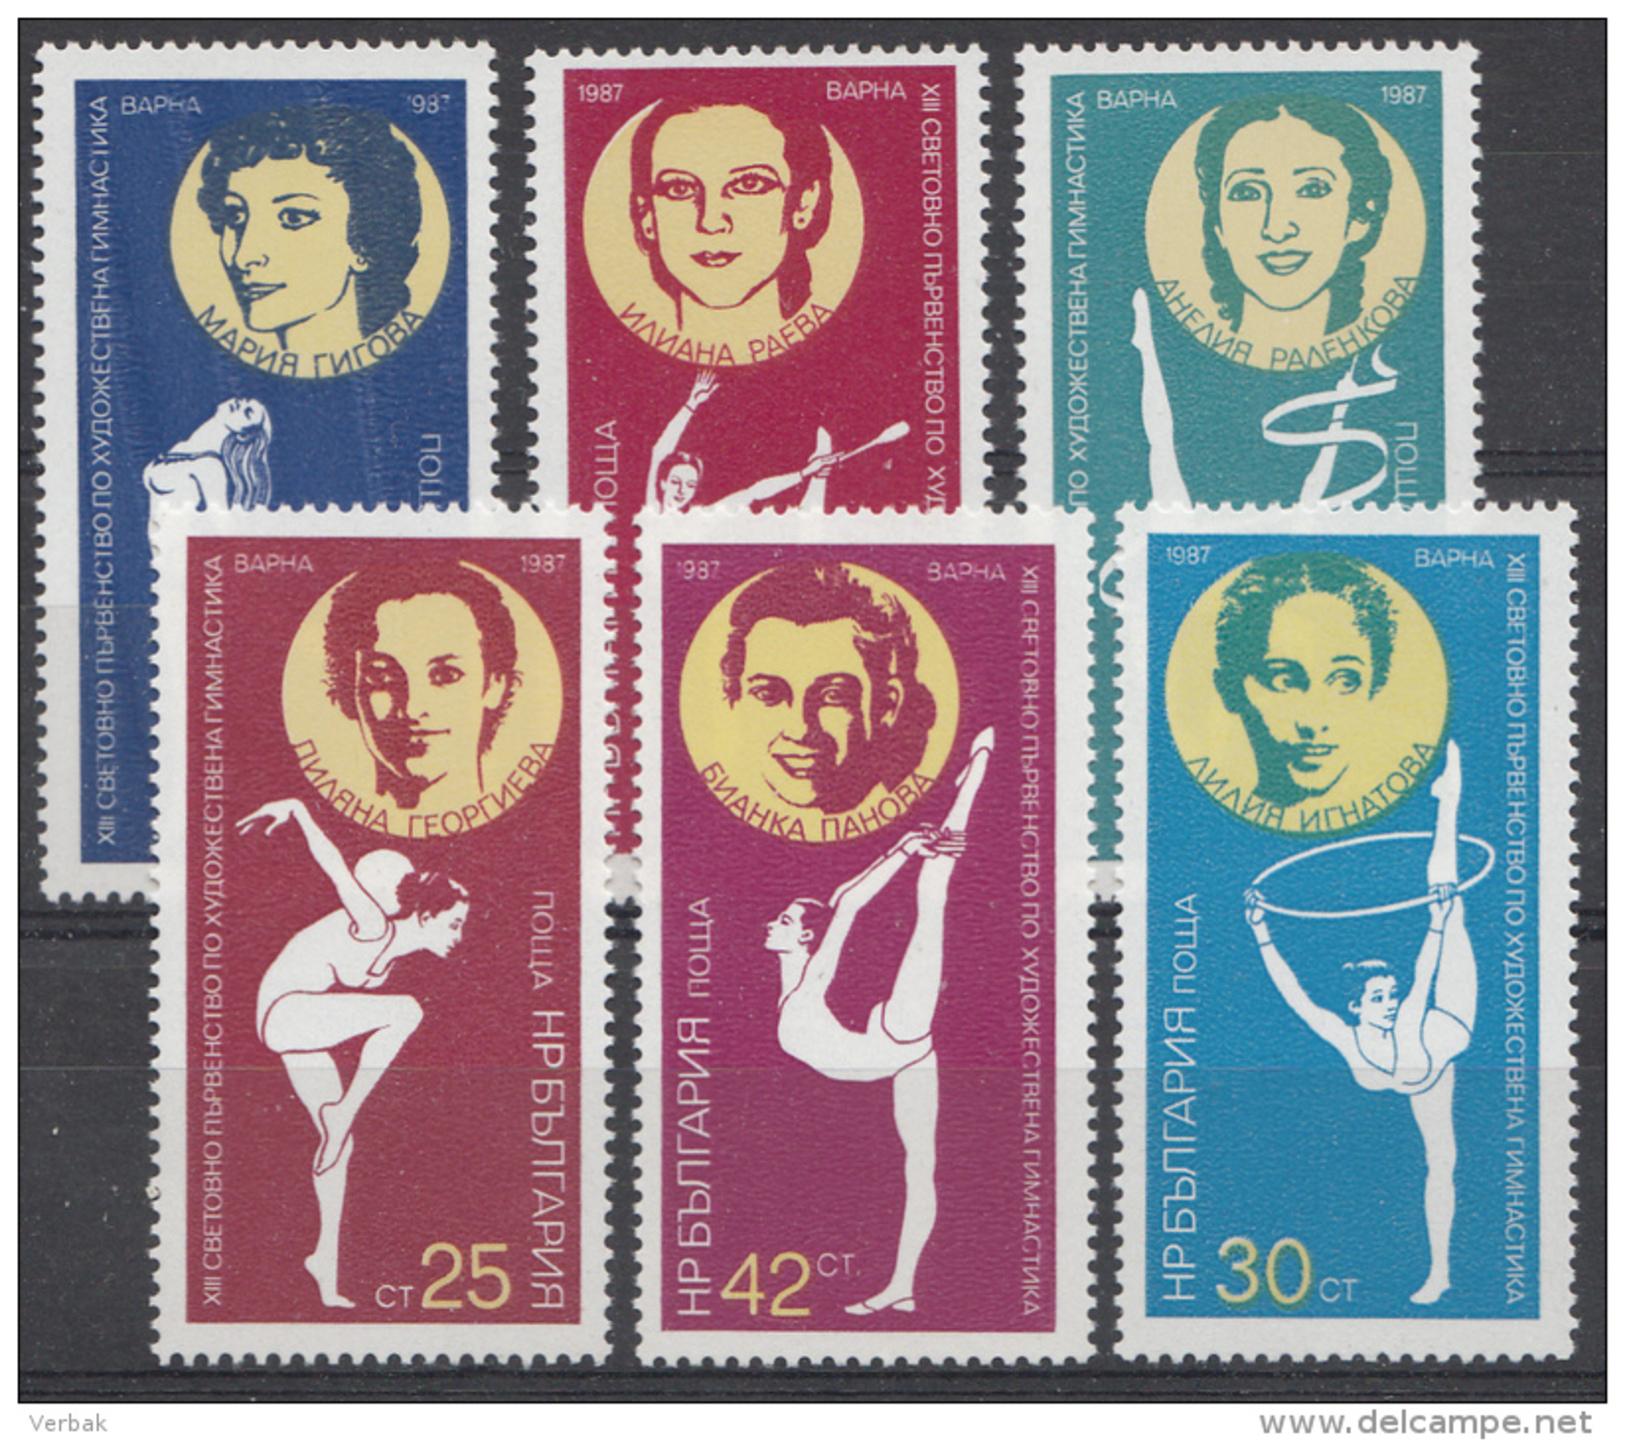 BULGARIJE / BULGARIEN MI.NR.3588-3593 MNH / POSTFRIS / NEUF SANS CHARNIERE 1987 - Nuovi